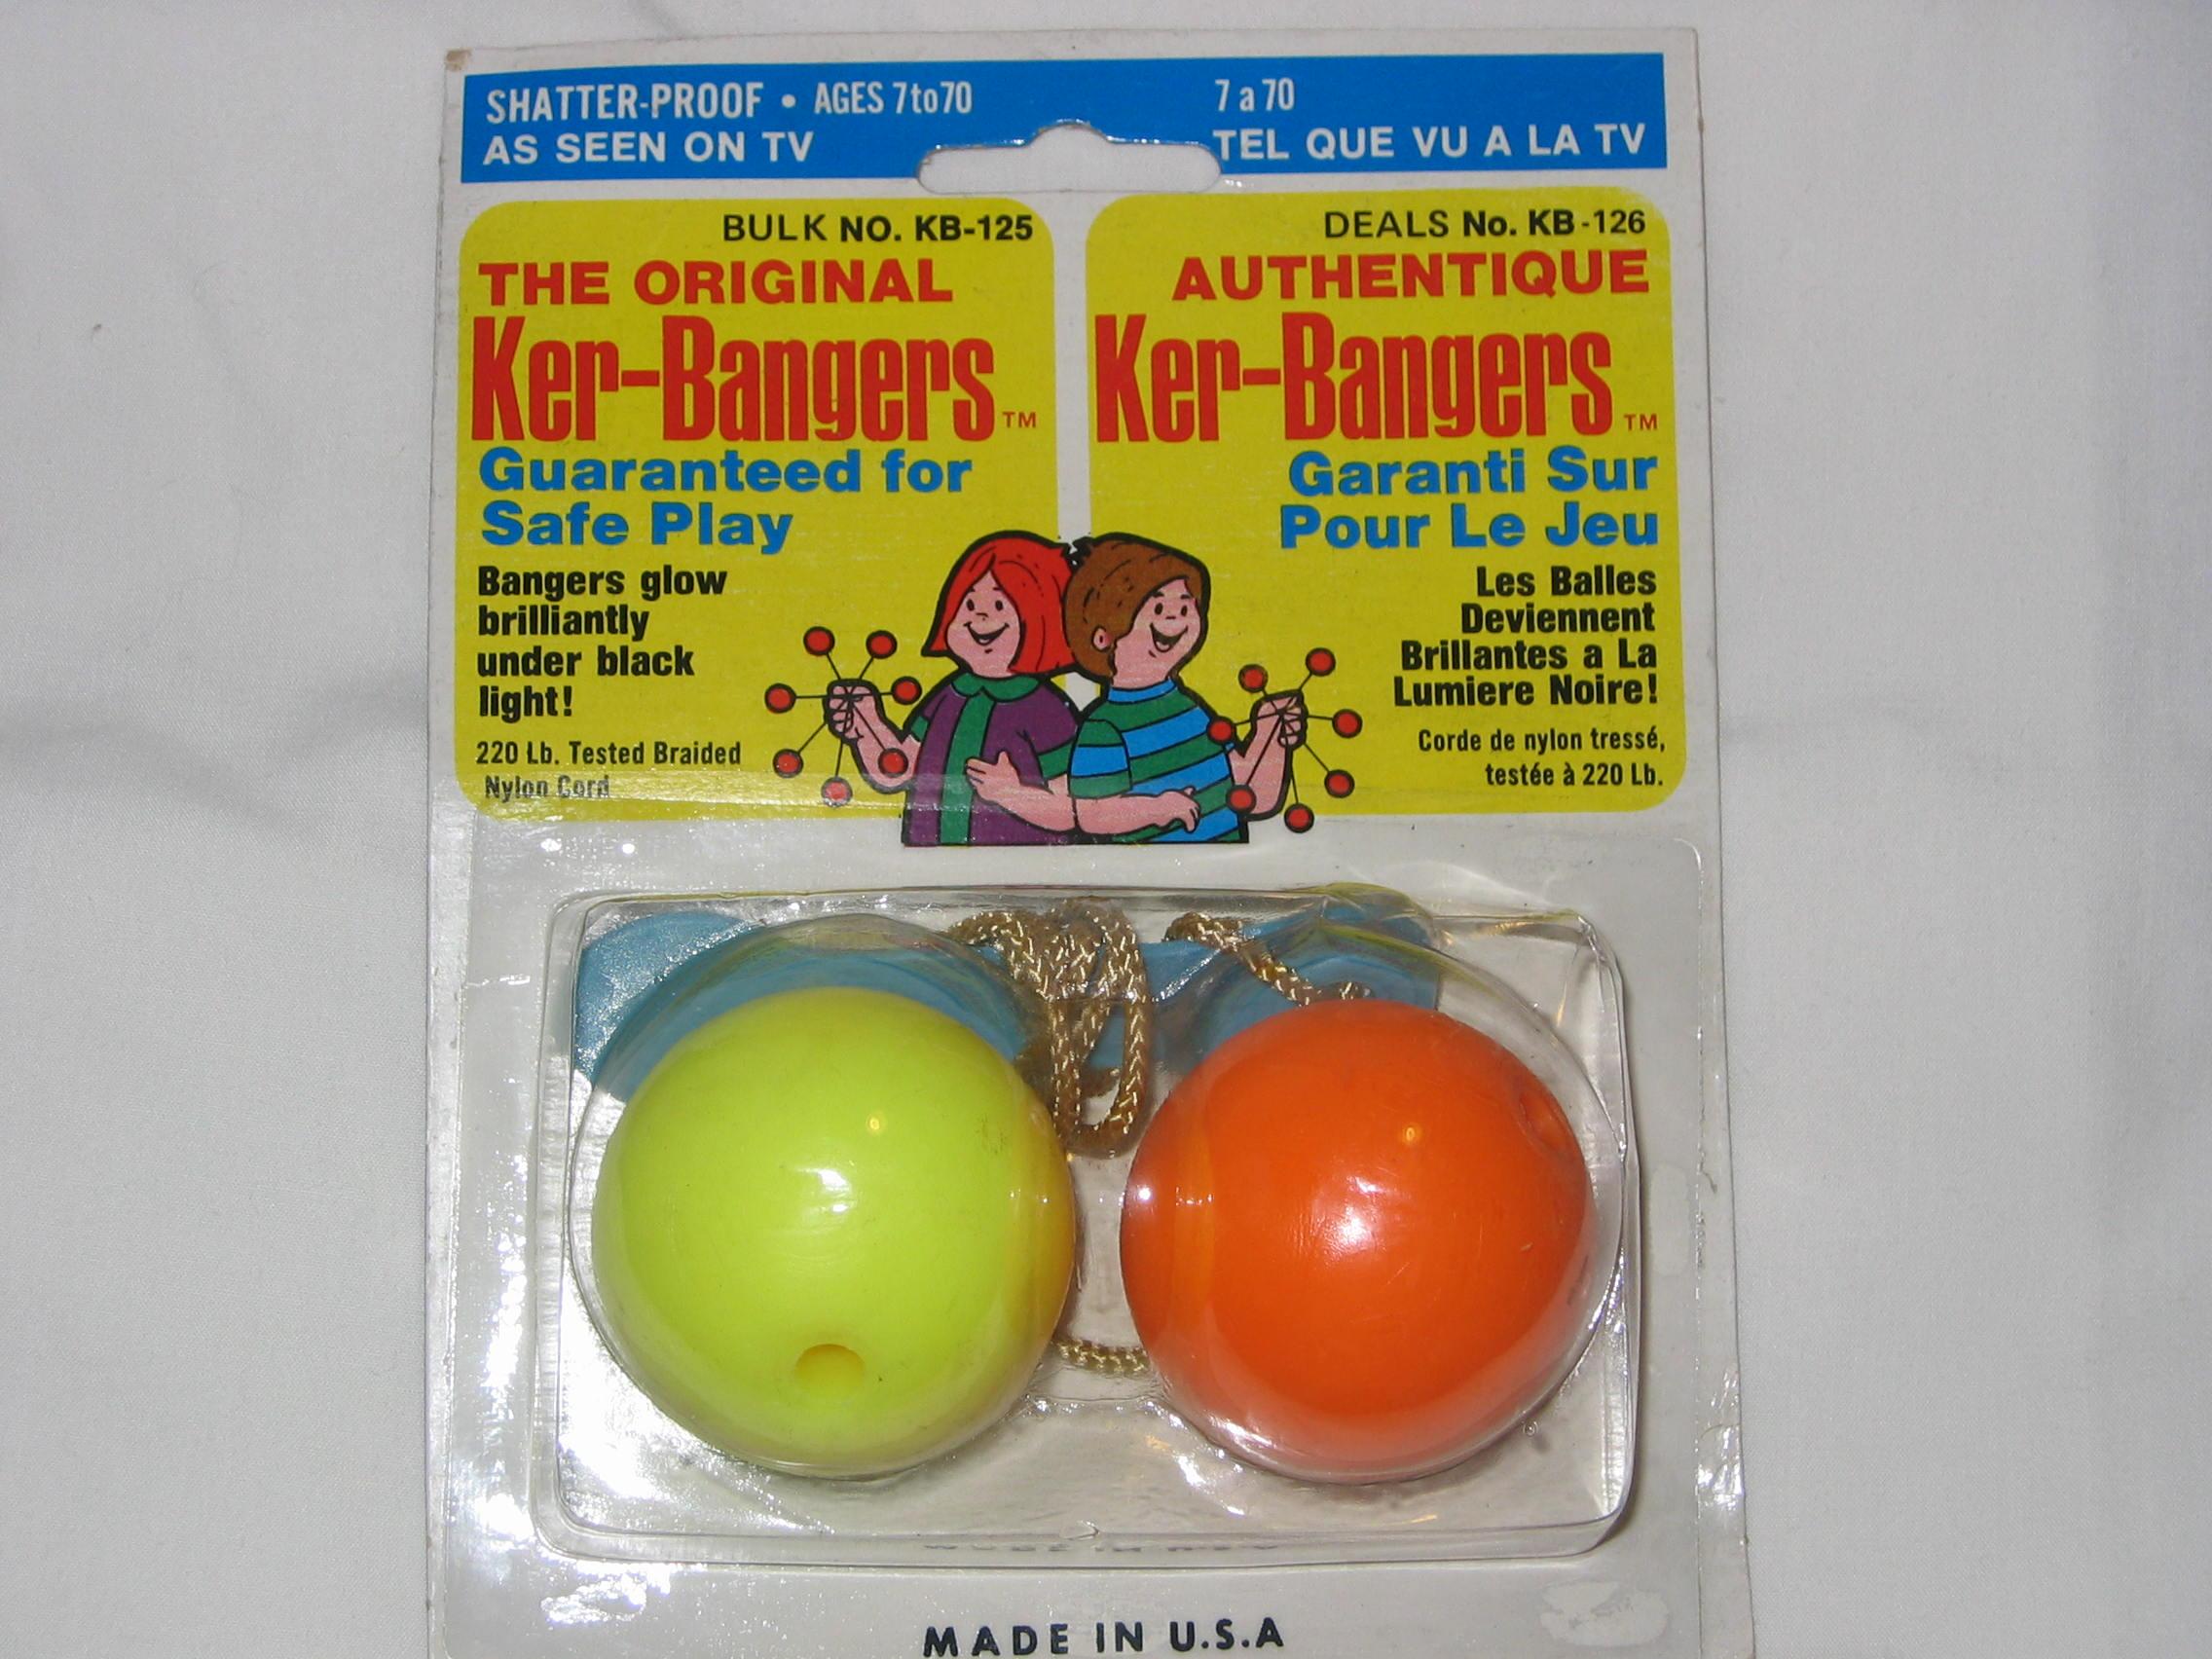 KerbangersFront1.jpg